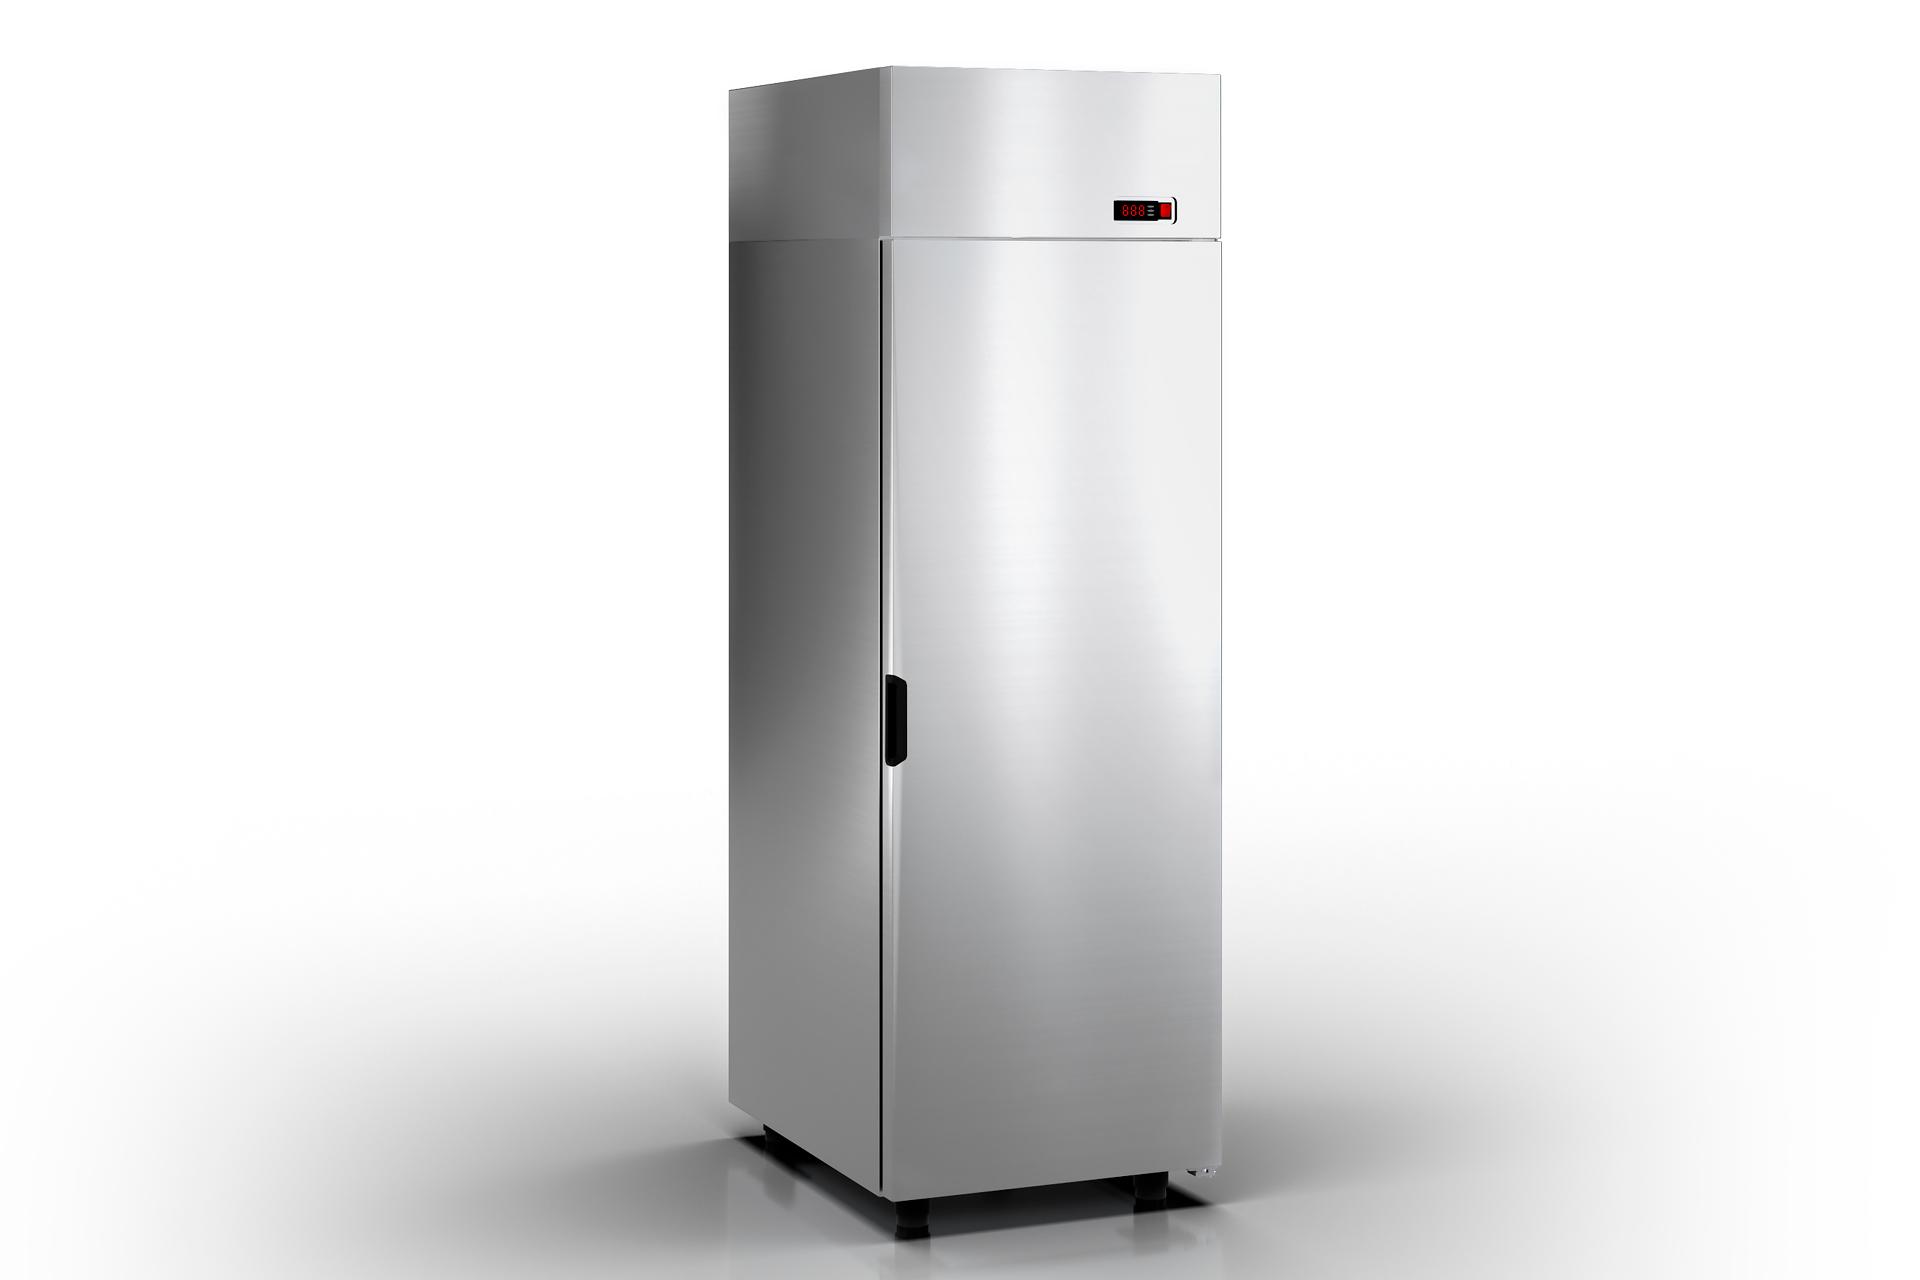 Szafy chłodnicze Kansas VАZG 066/076/086 MT/HT 1HD 210-D500/D600/D700A-065